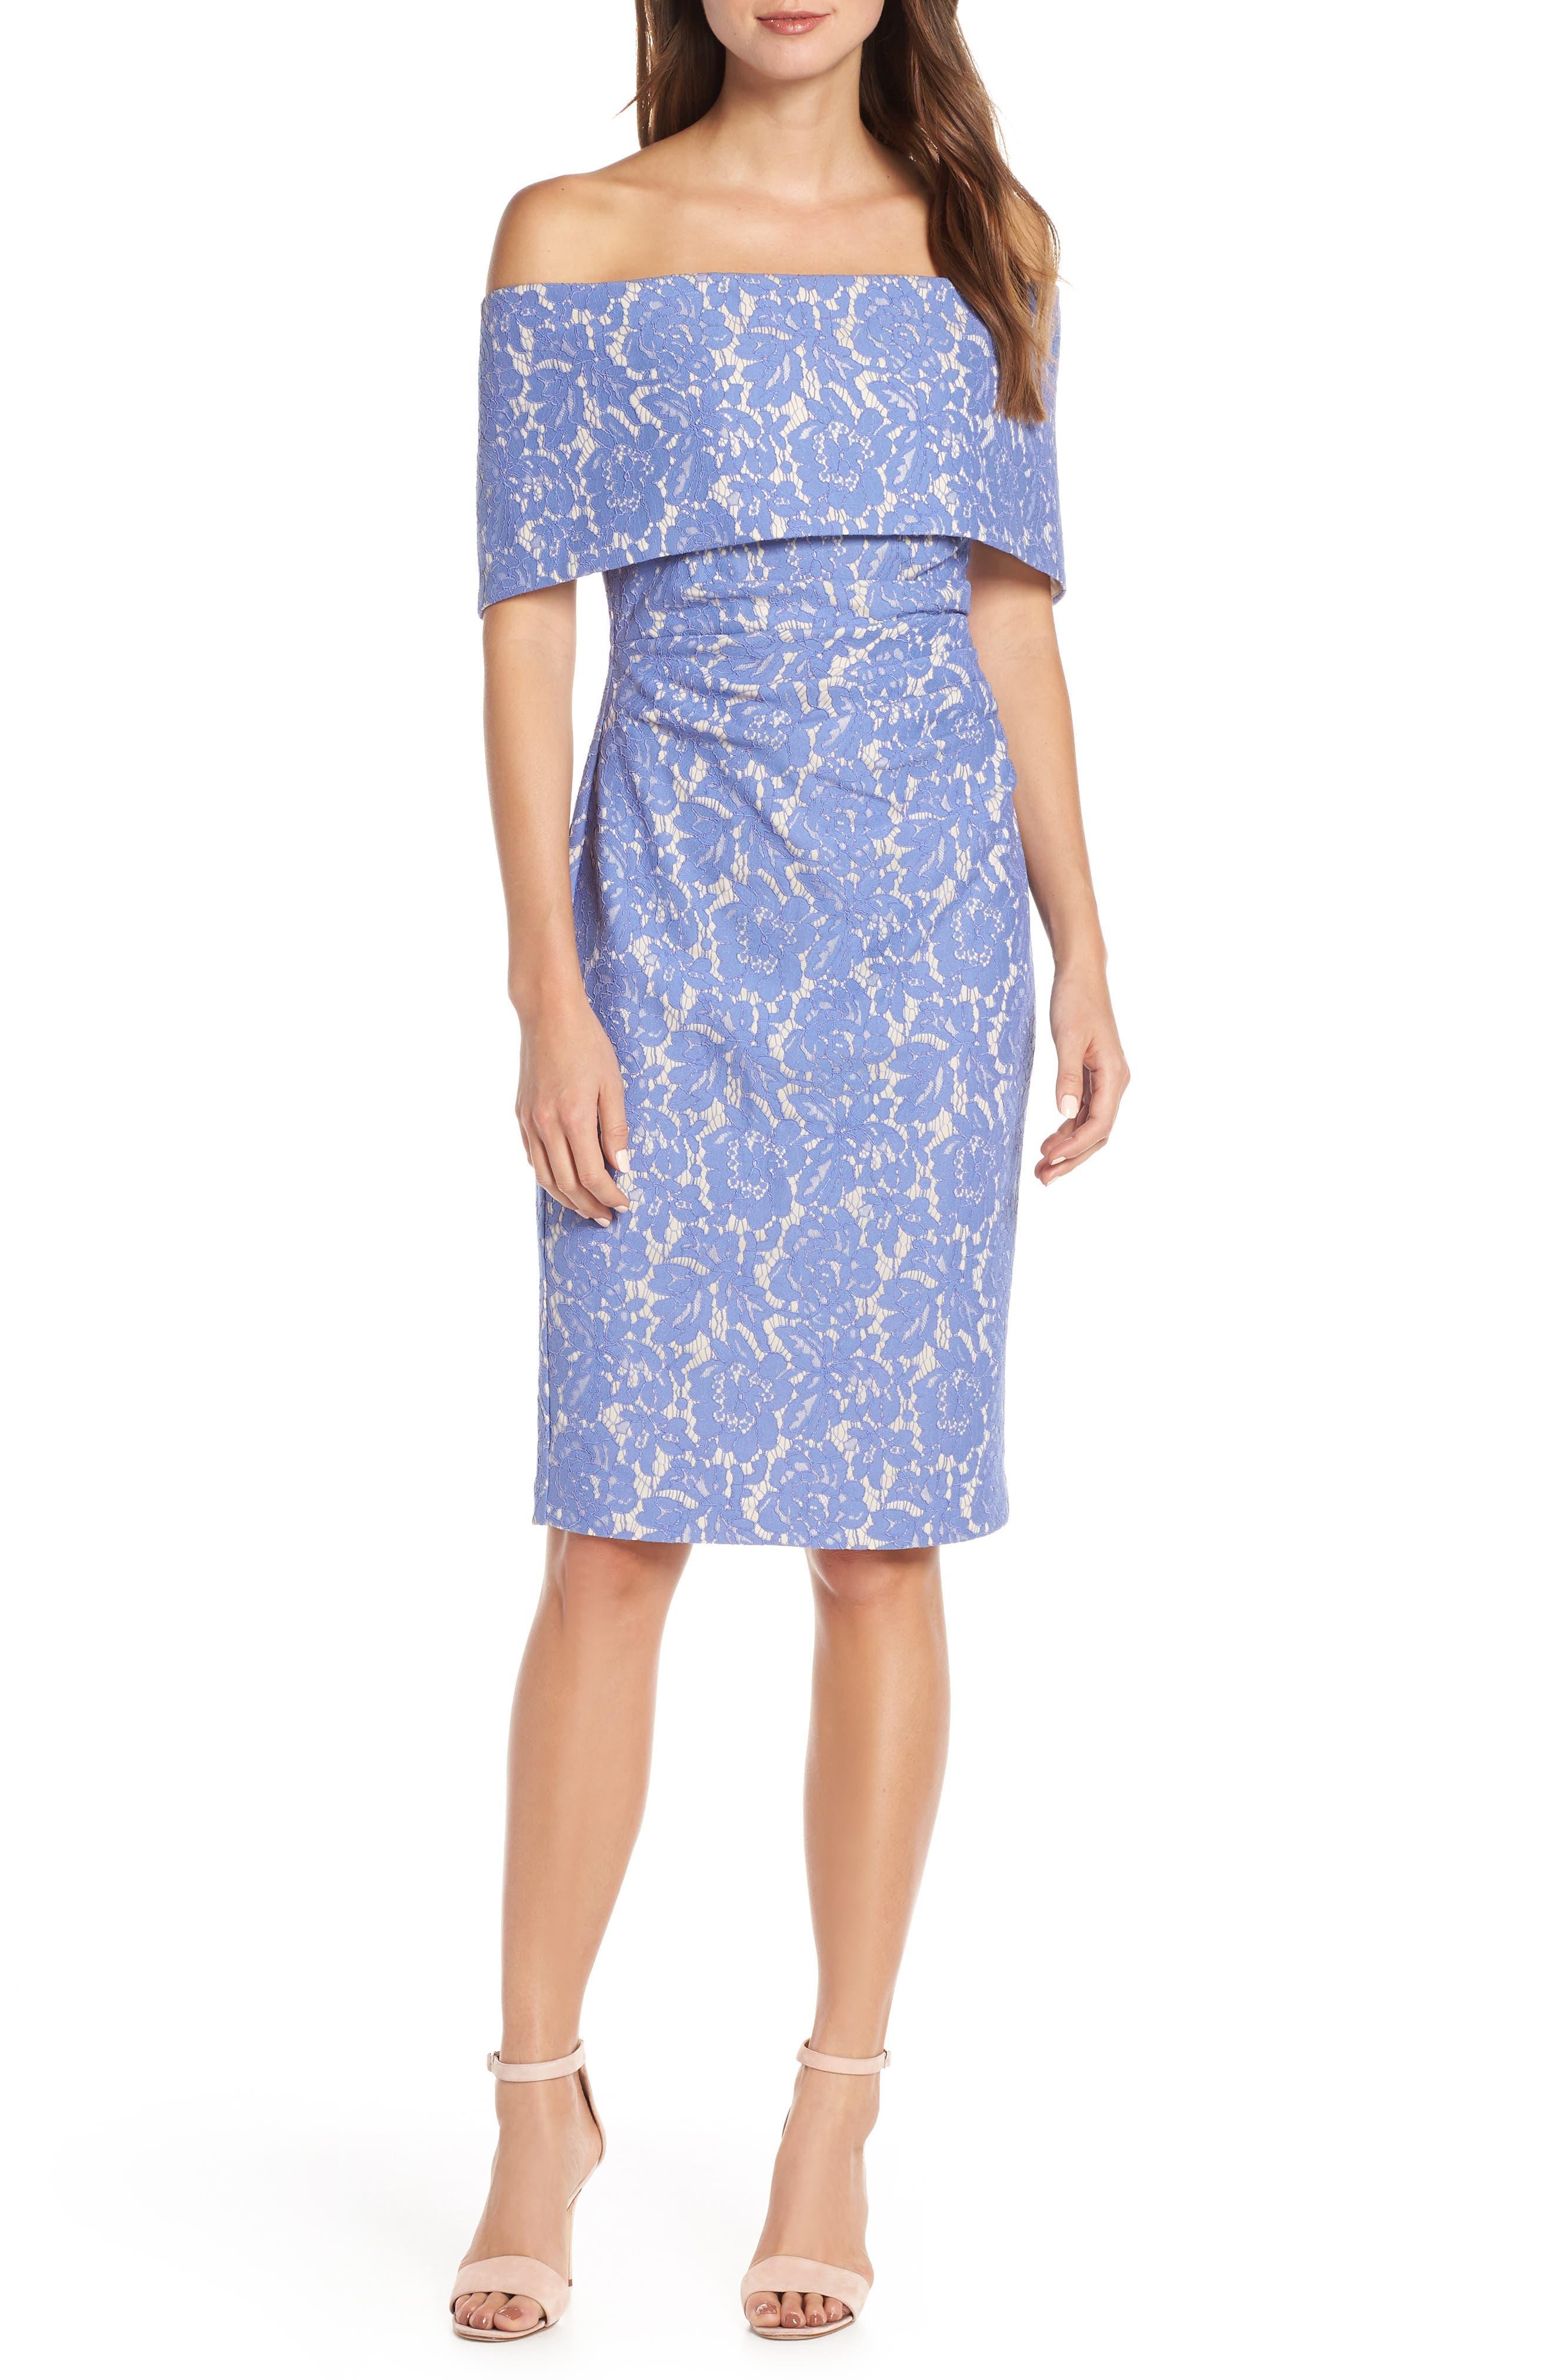 VINCE CAMUTO Off the Shoulder Lace Sheath Dress, Main, color, PERIWINKLE